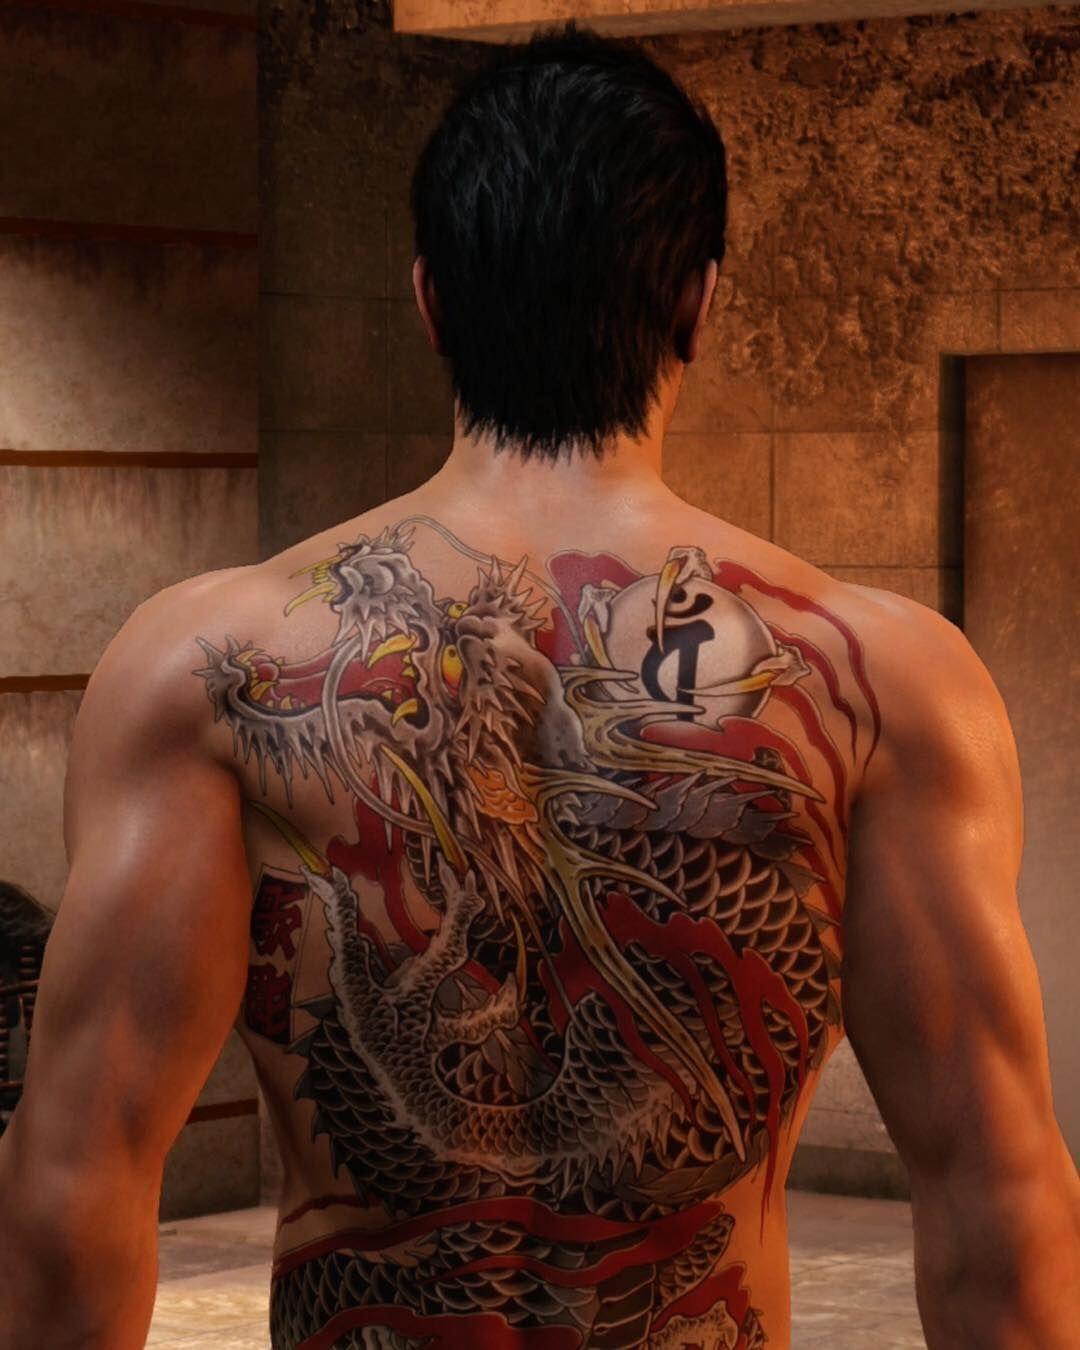 japanese tattoos designs and meanings Japanesetattoos